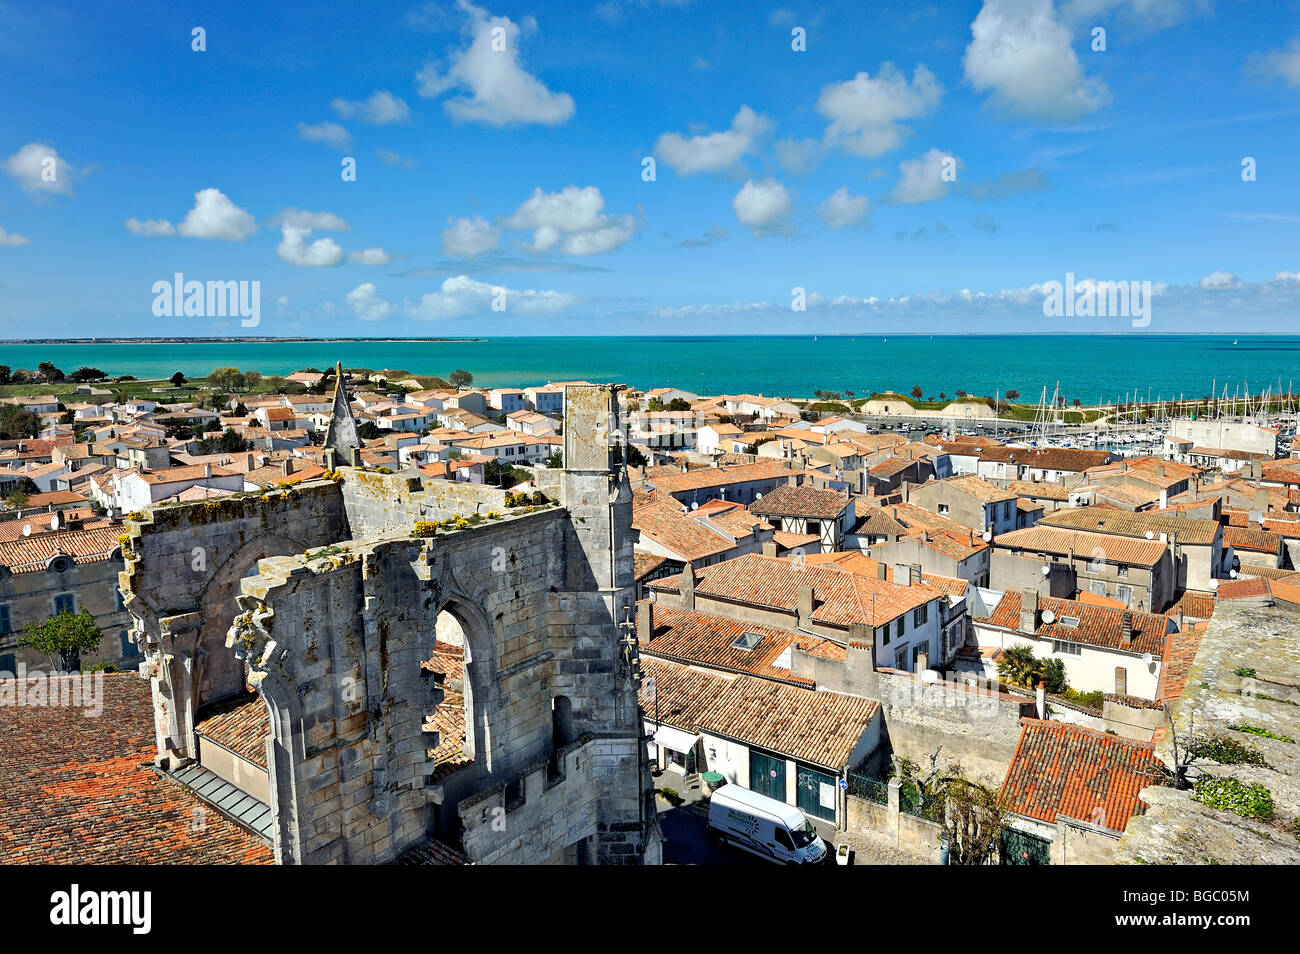 Saint Martin de Re, France. - Stock Image